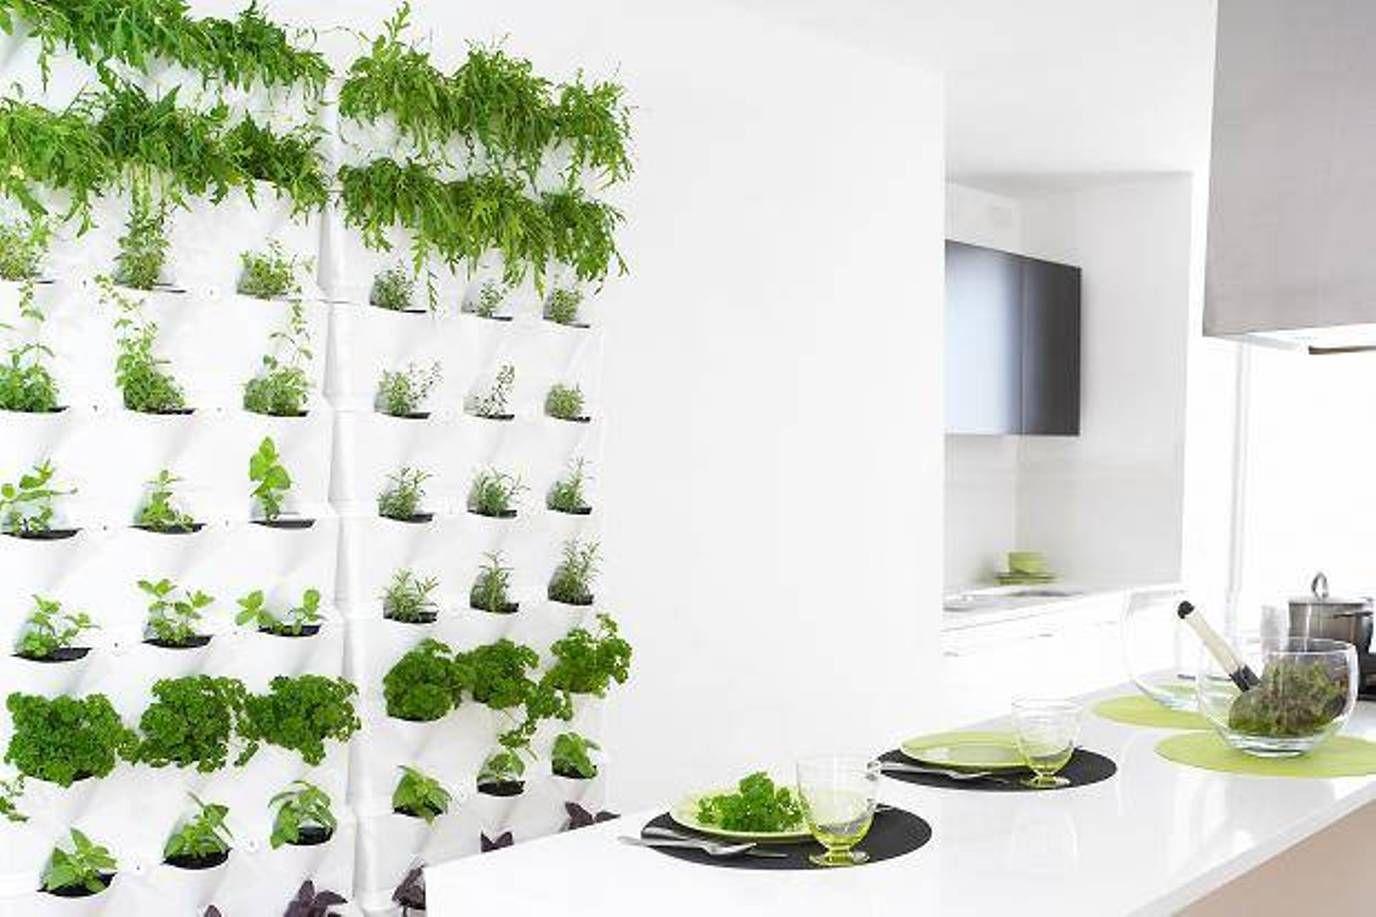 вред живая зелень на кухне фото отказаться приема